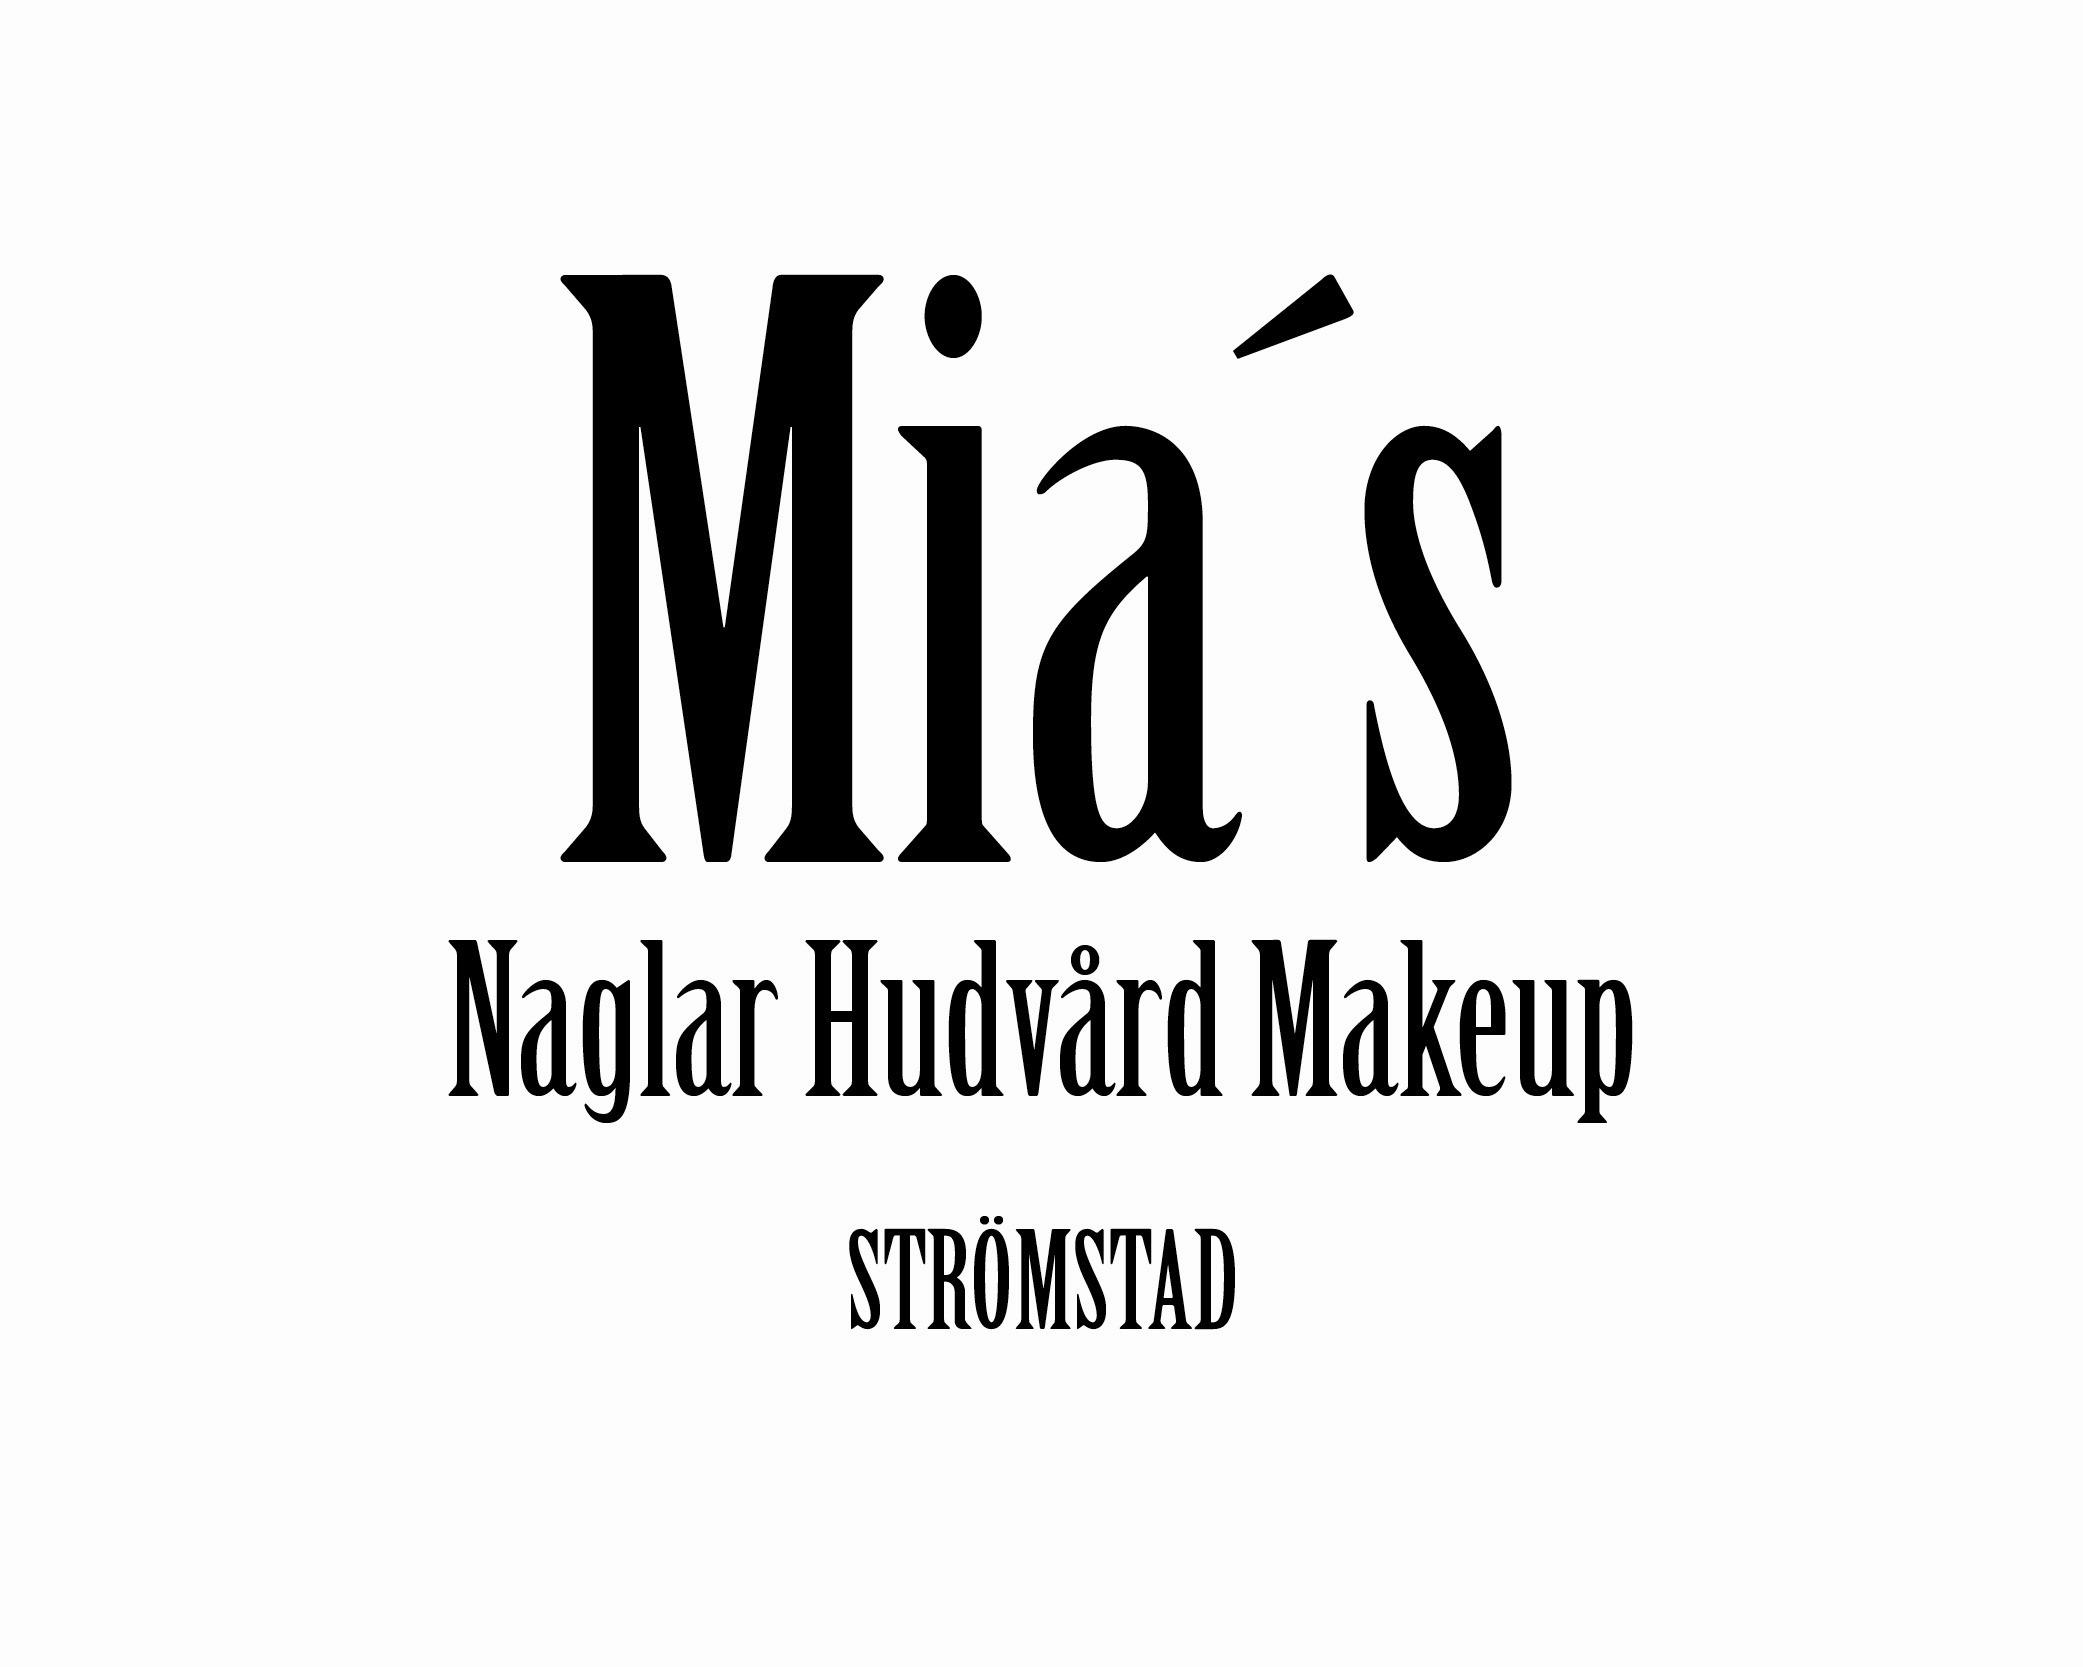 Mia S Naglar Hudvard Makeup Stromstad Bokadirekt